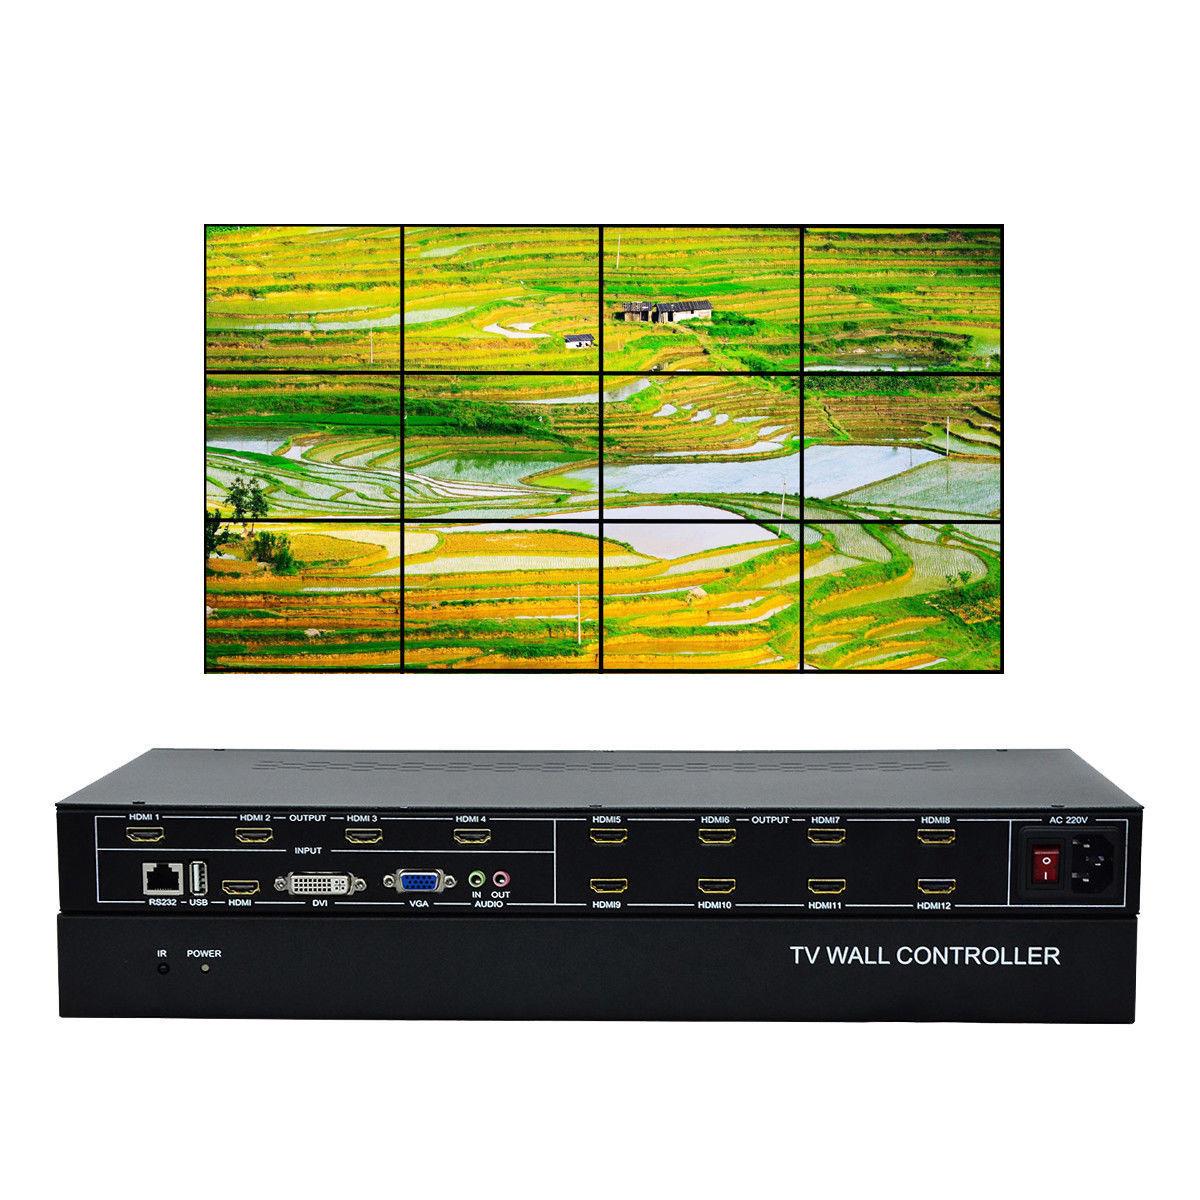 ESZYM 12 Kanal TV Video Wand Controller 3x4 2x6 2x5 HDMI DVI VGA USB video Prozessor